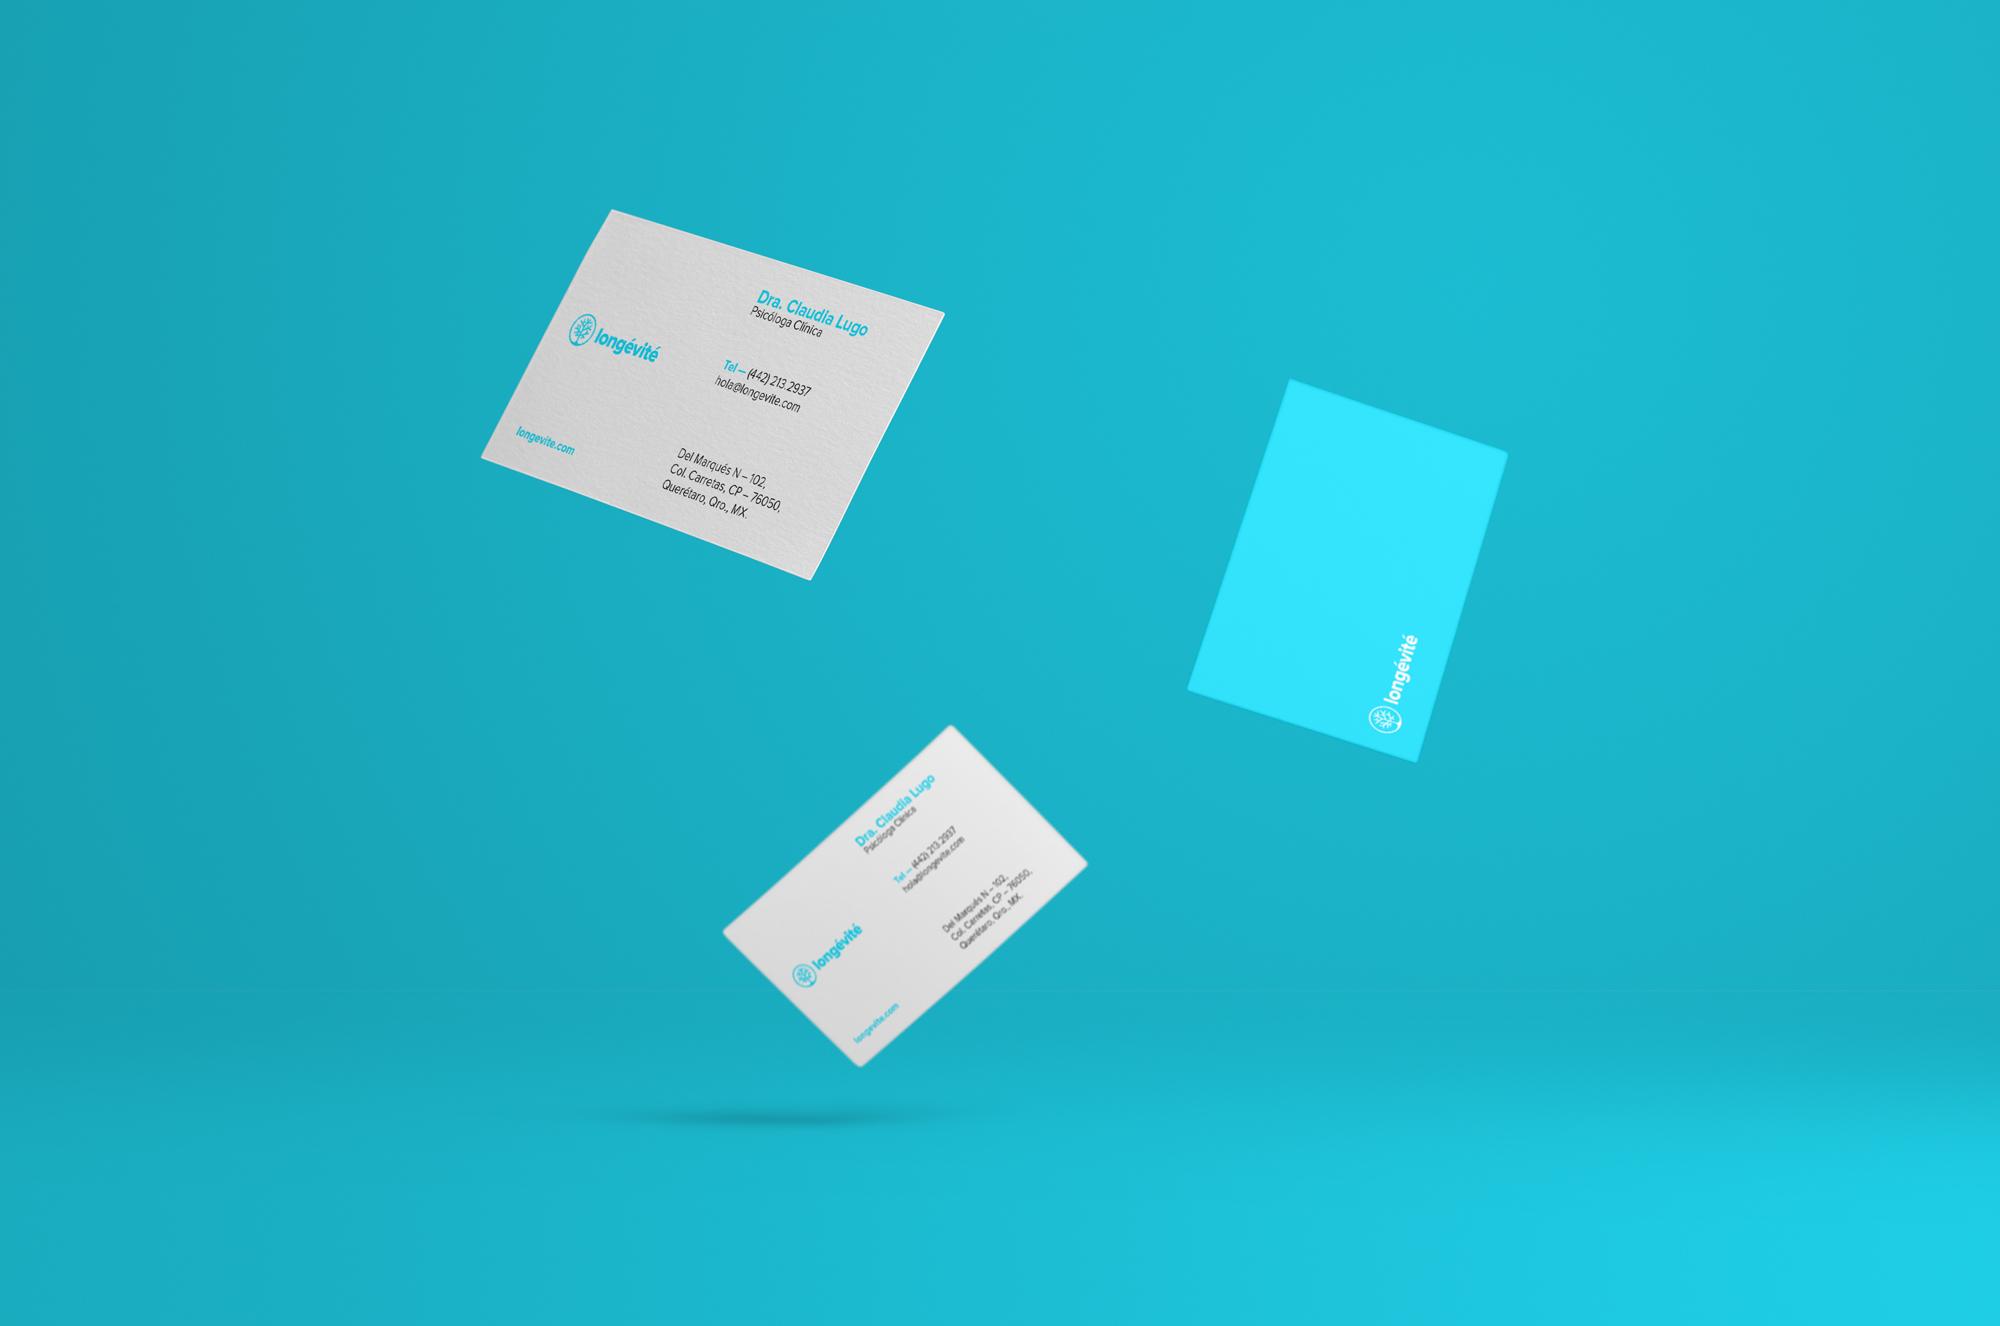 raniev-rod-alvarez-diseño-gráfico-queretaro-longevite-1-business-cards